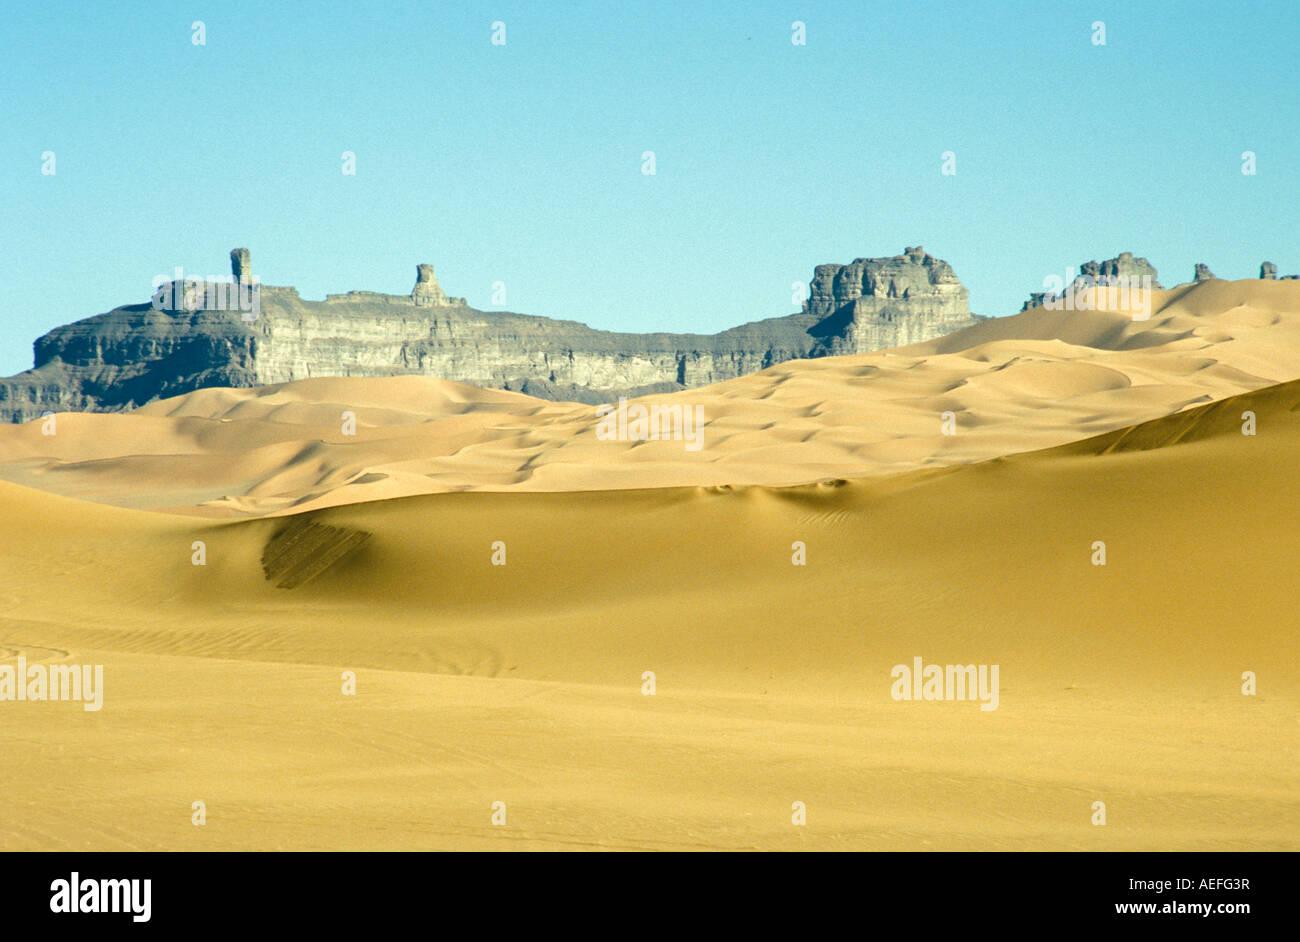 Tadrart Acacus desert Sahara Lybia - Stock Image